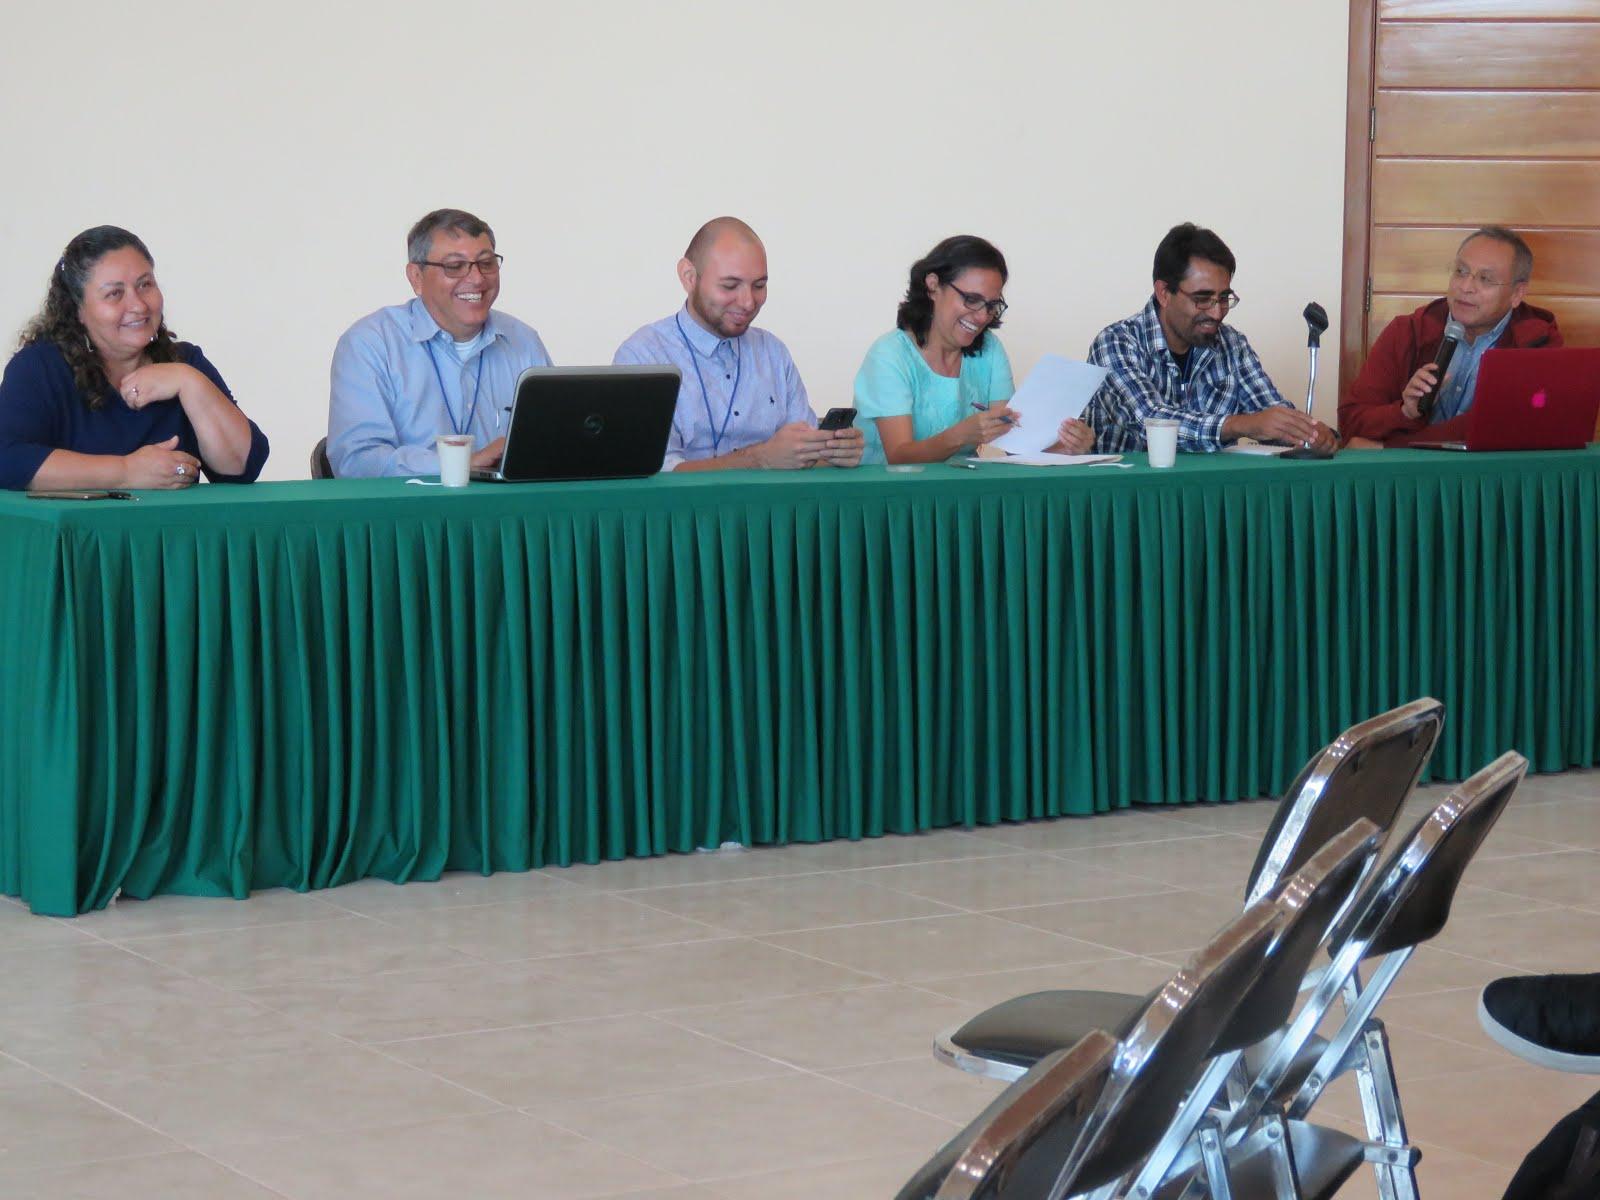 Mesa-Debate: multidisciplina, interdisciplina, transdisciplina...